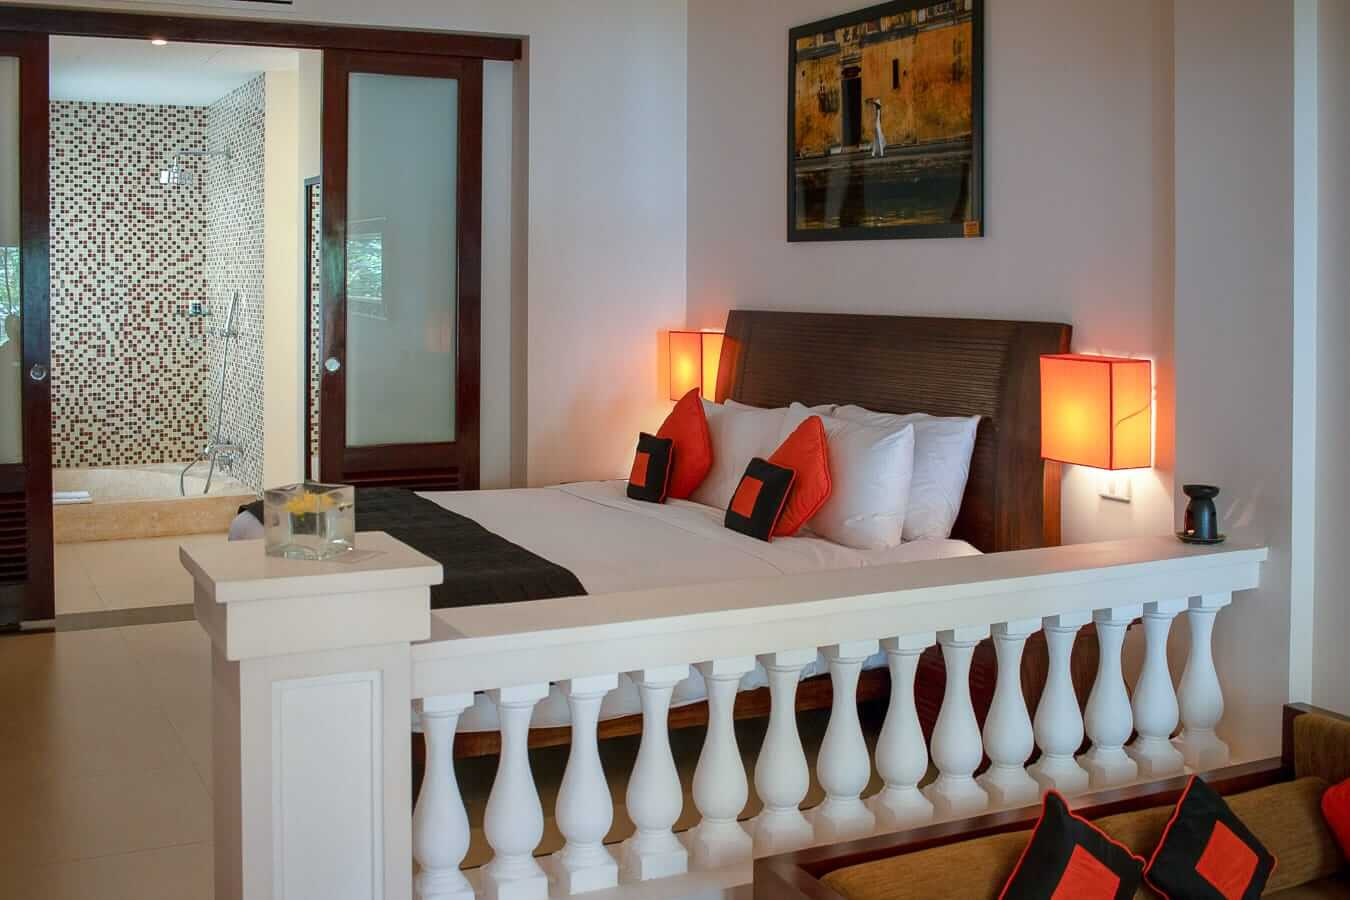 Anantara Hotel: Where to stay in Hoi An